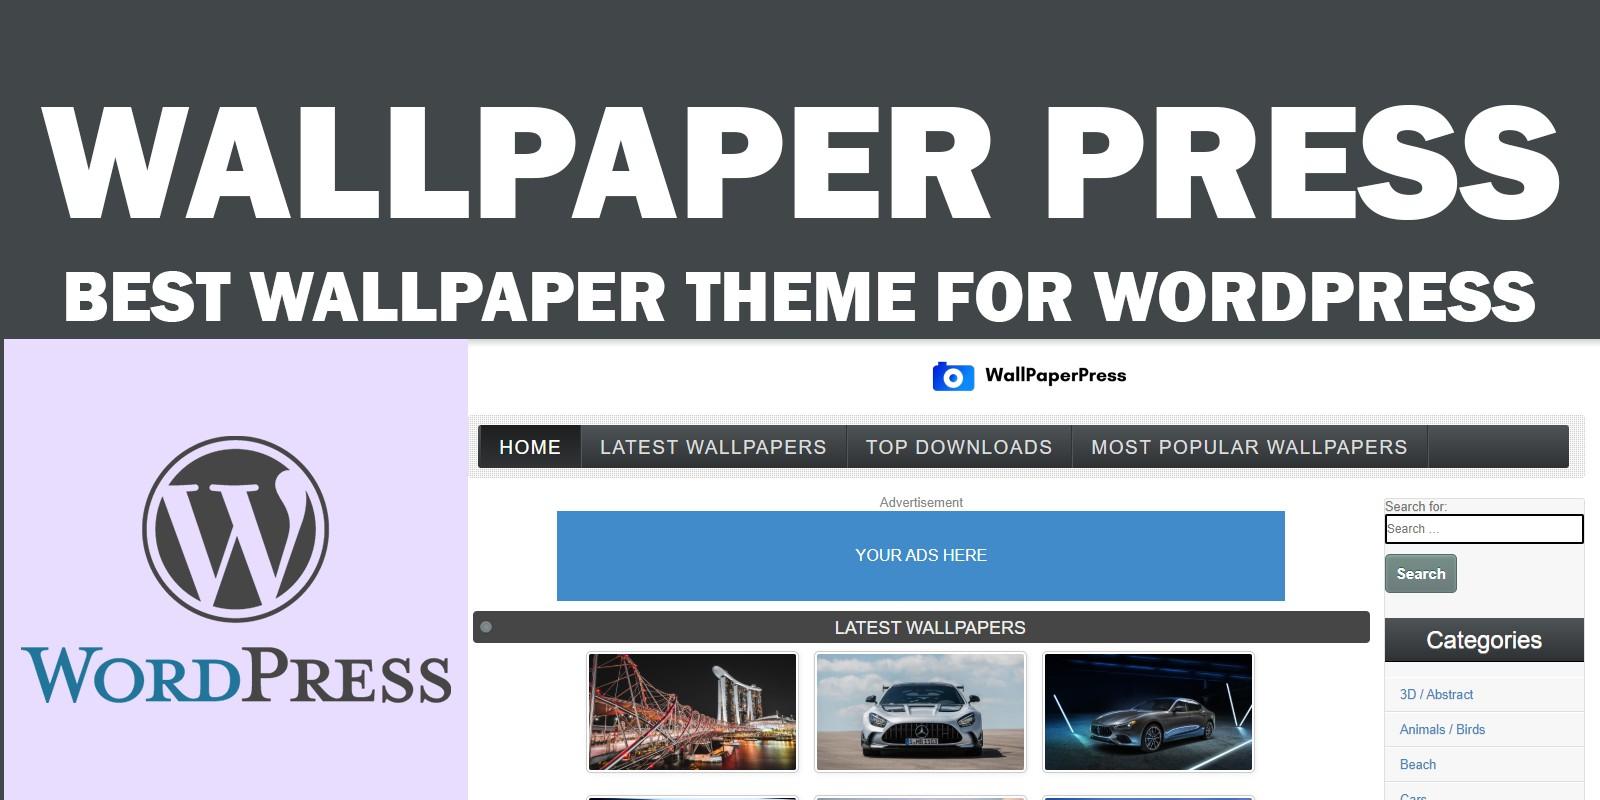 WallpaperPress - Wallpaper theme for WordPress